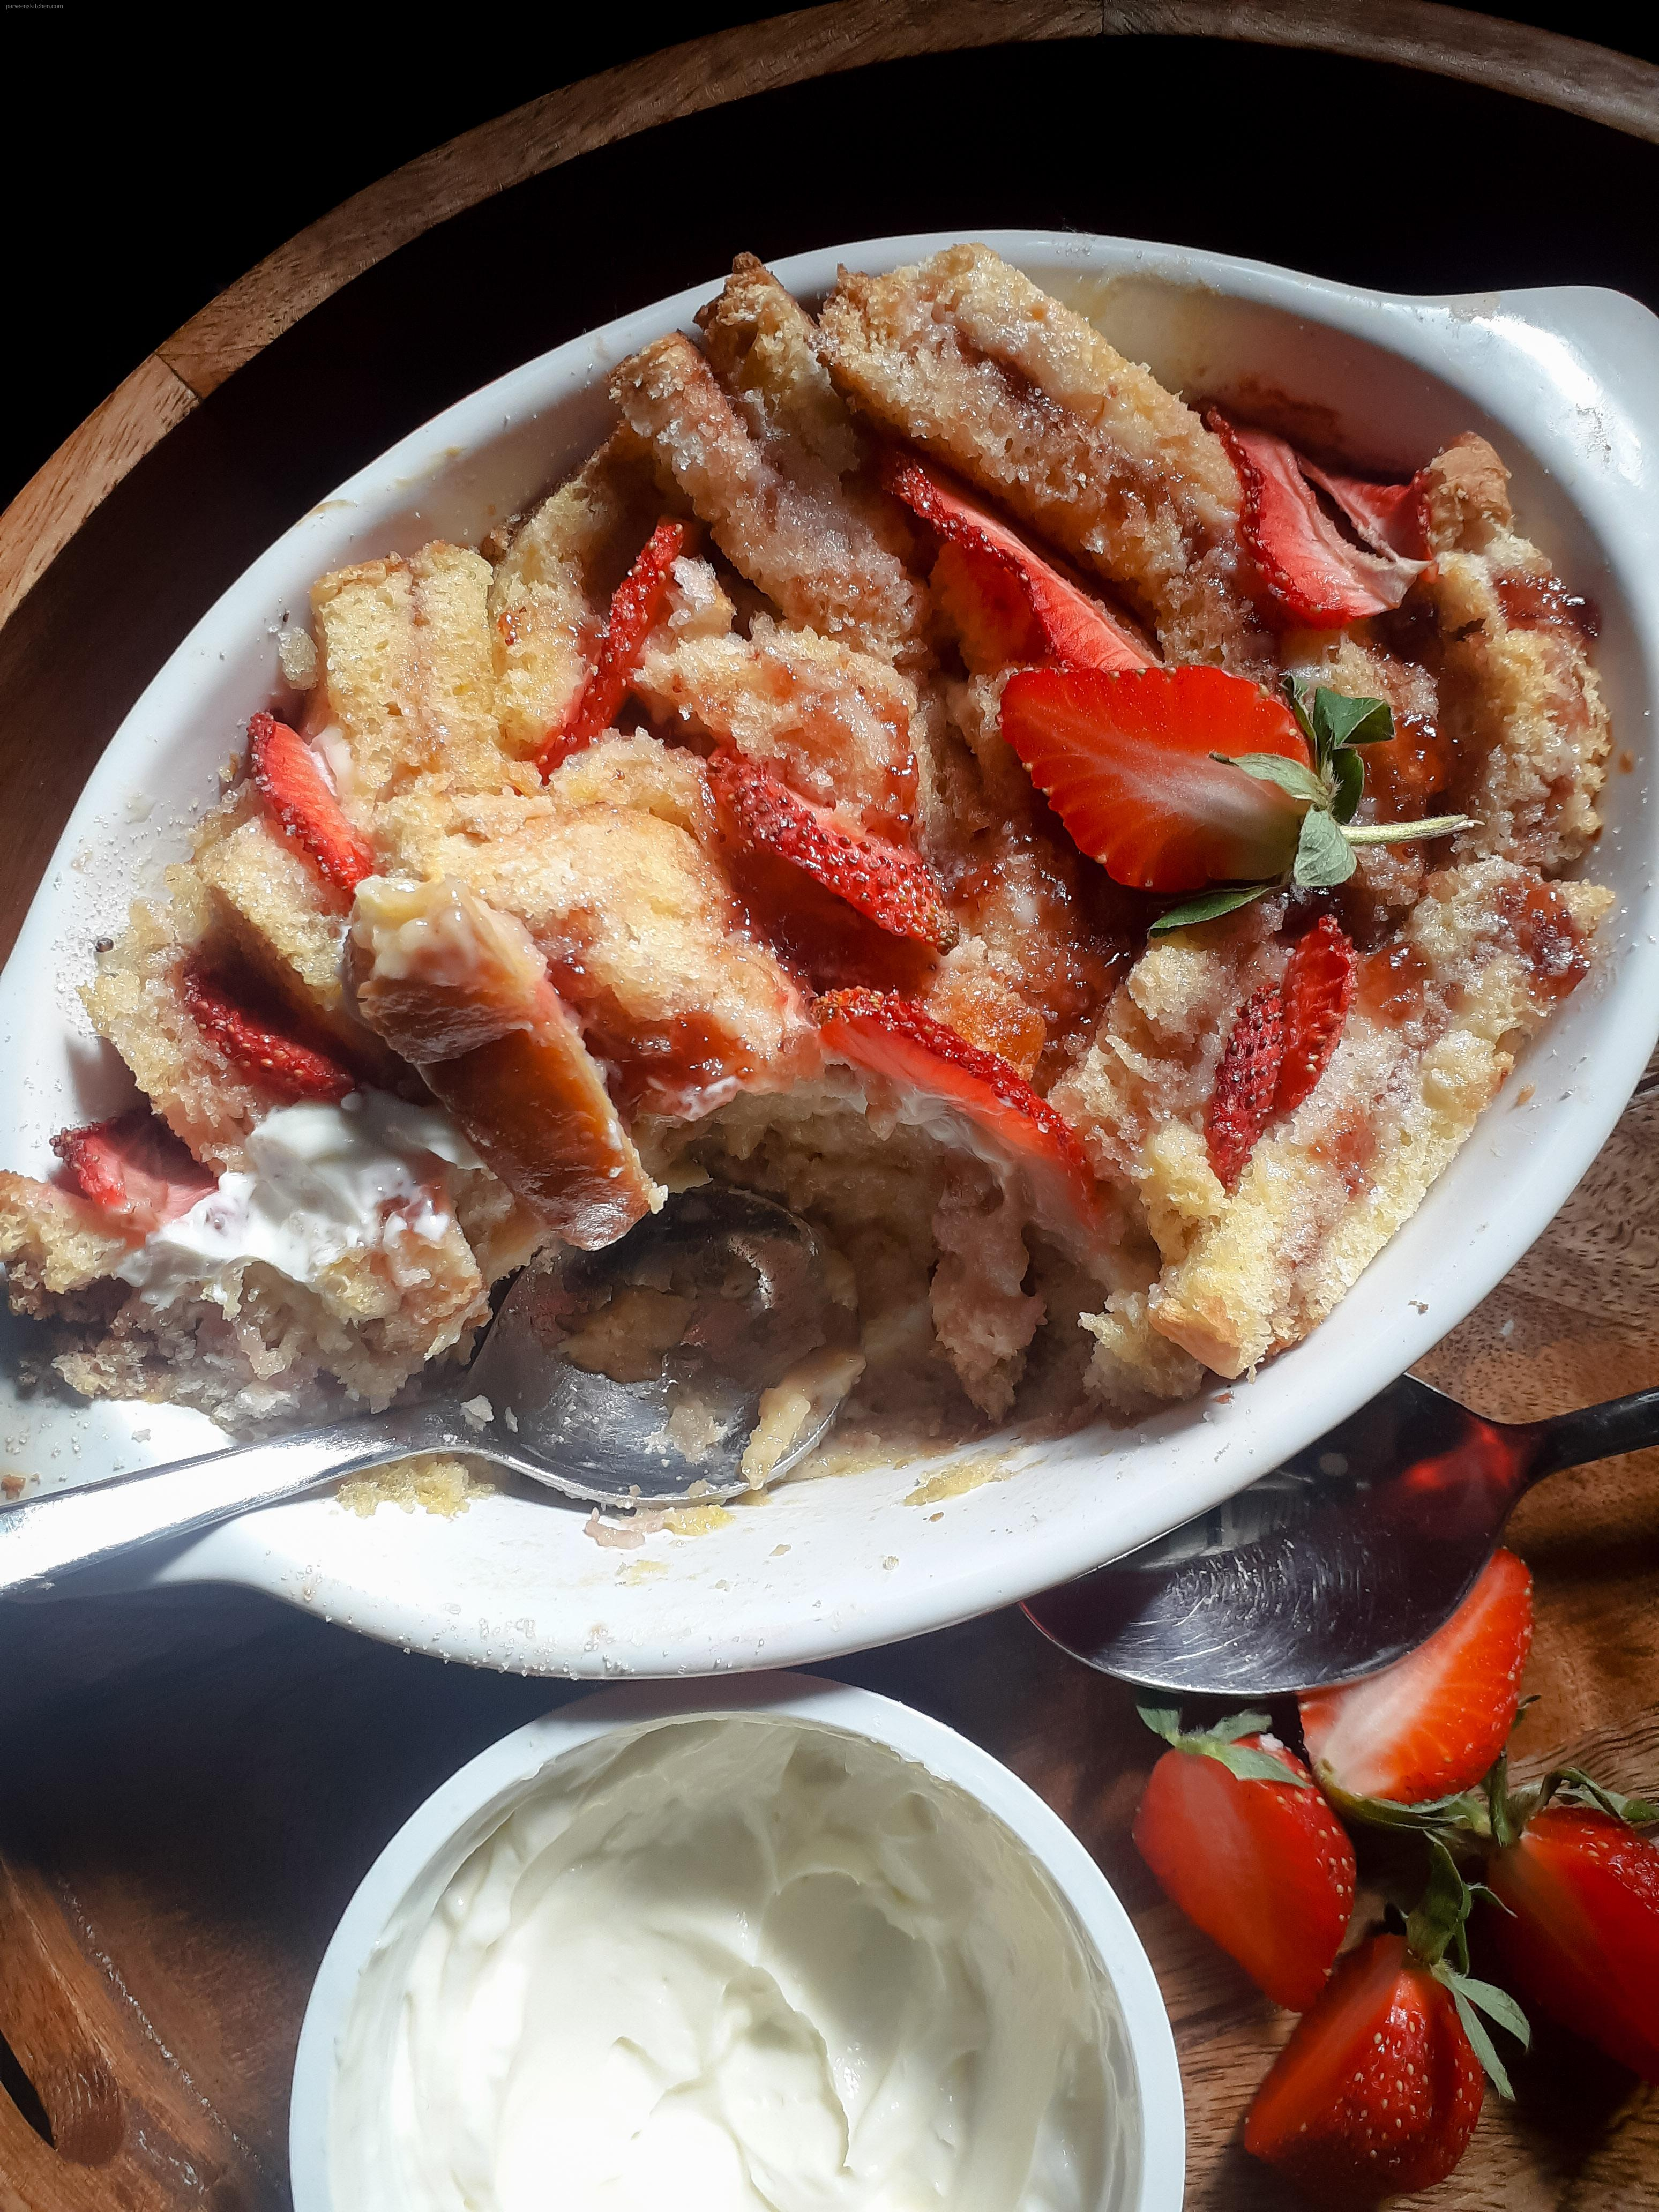 Strawberry Cheesecake French Toast Bake